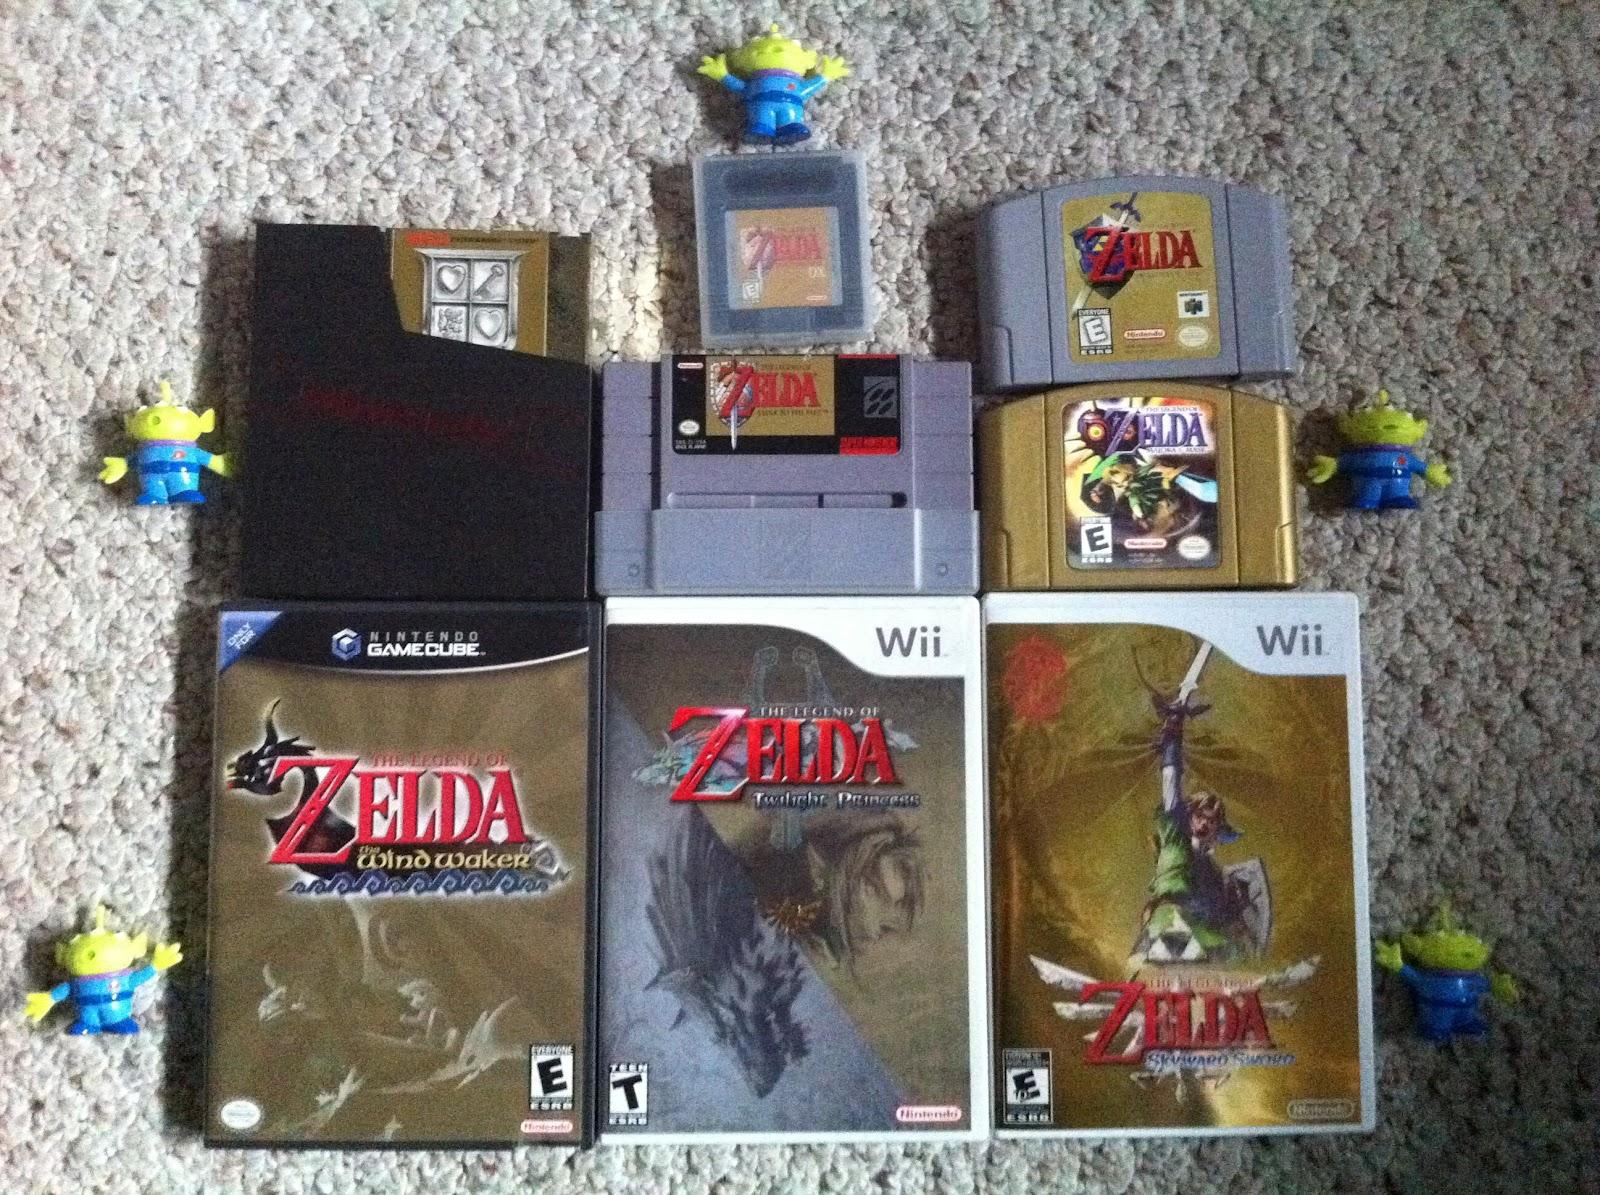 8d5e0f7d2786 My Ultimate Vice City Story: Timeless Collection: My Legends of Zelda